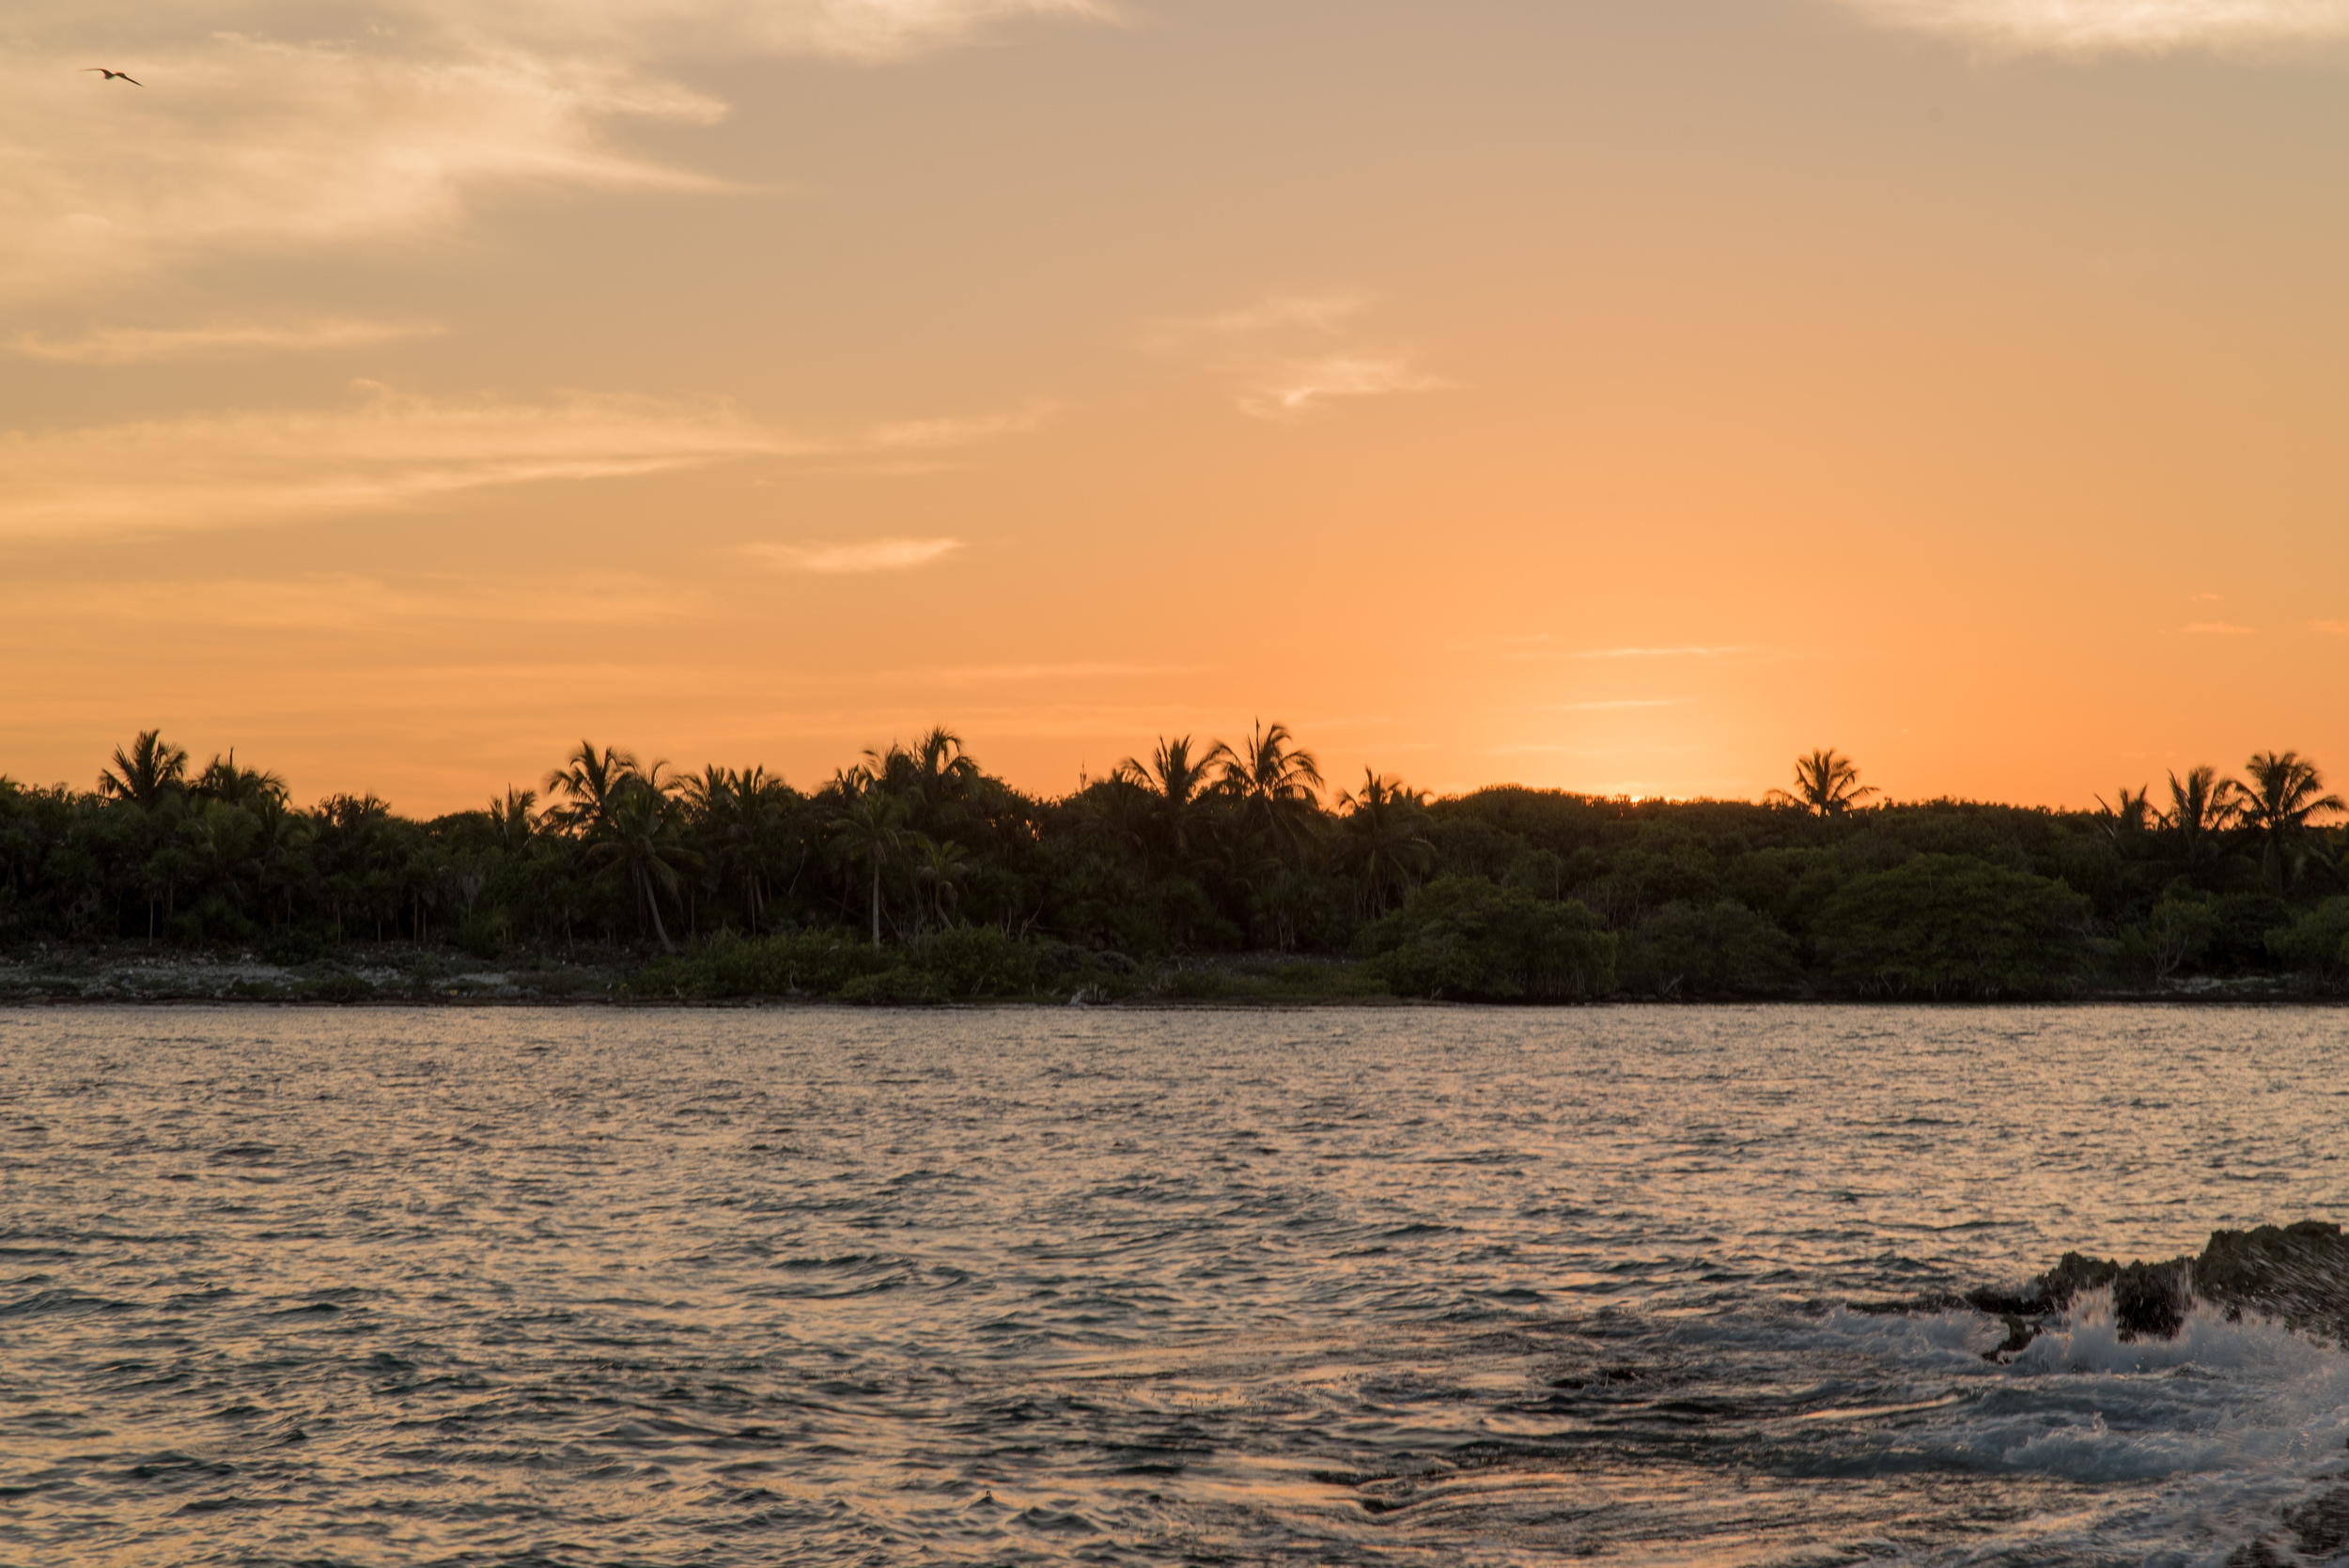 Mexico-Deserted-Island-097.jpg